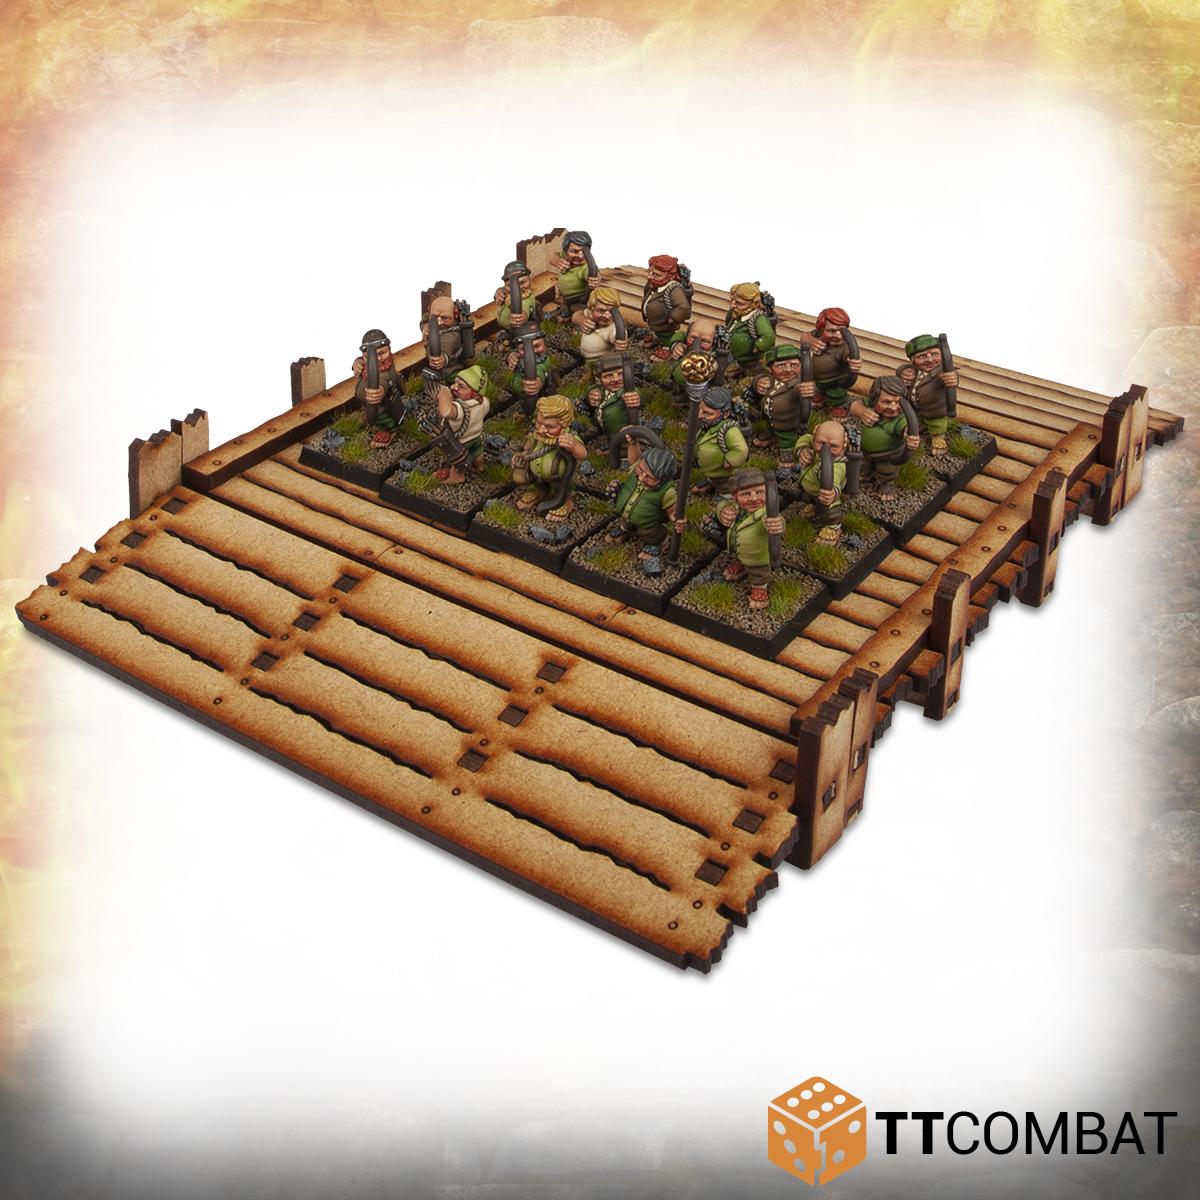 [Image: Bridge-Army-Background-copy.jpg]